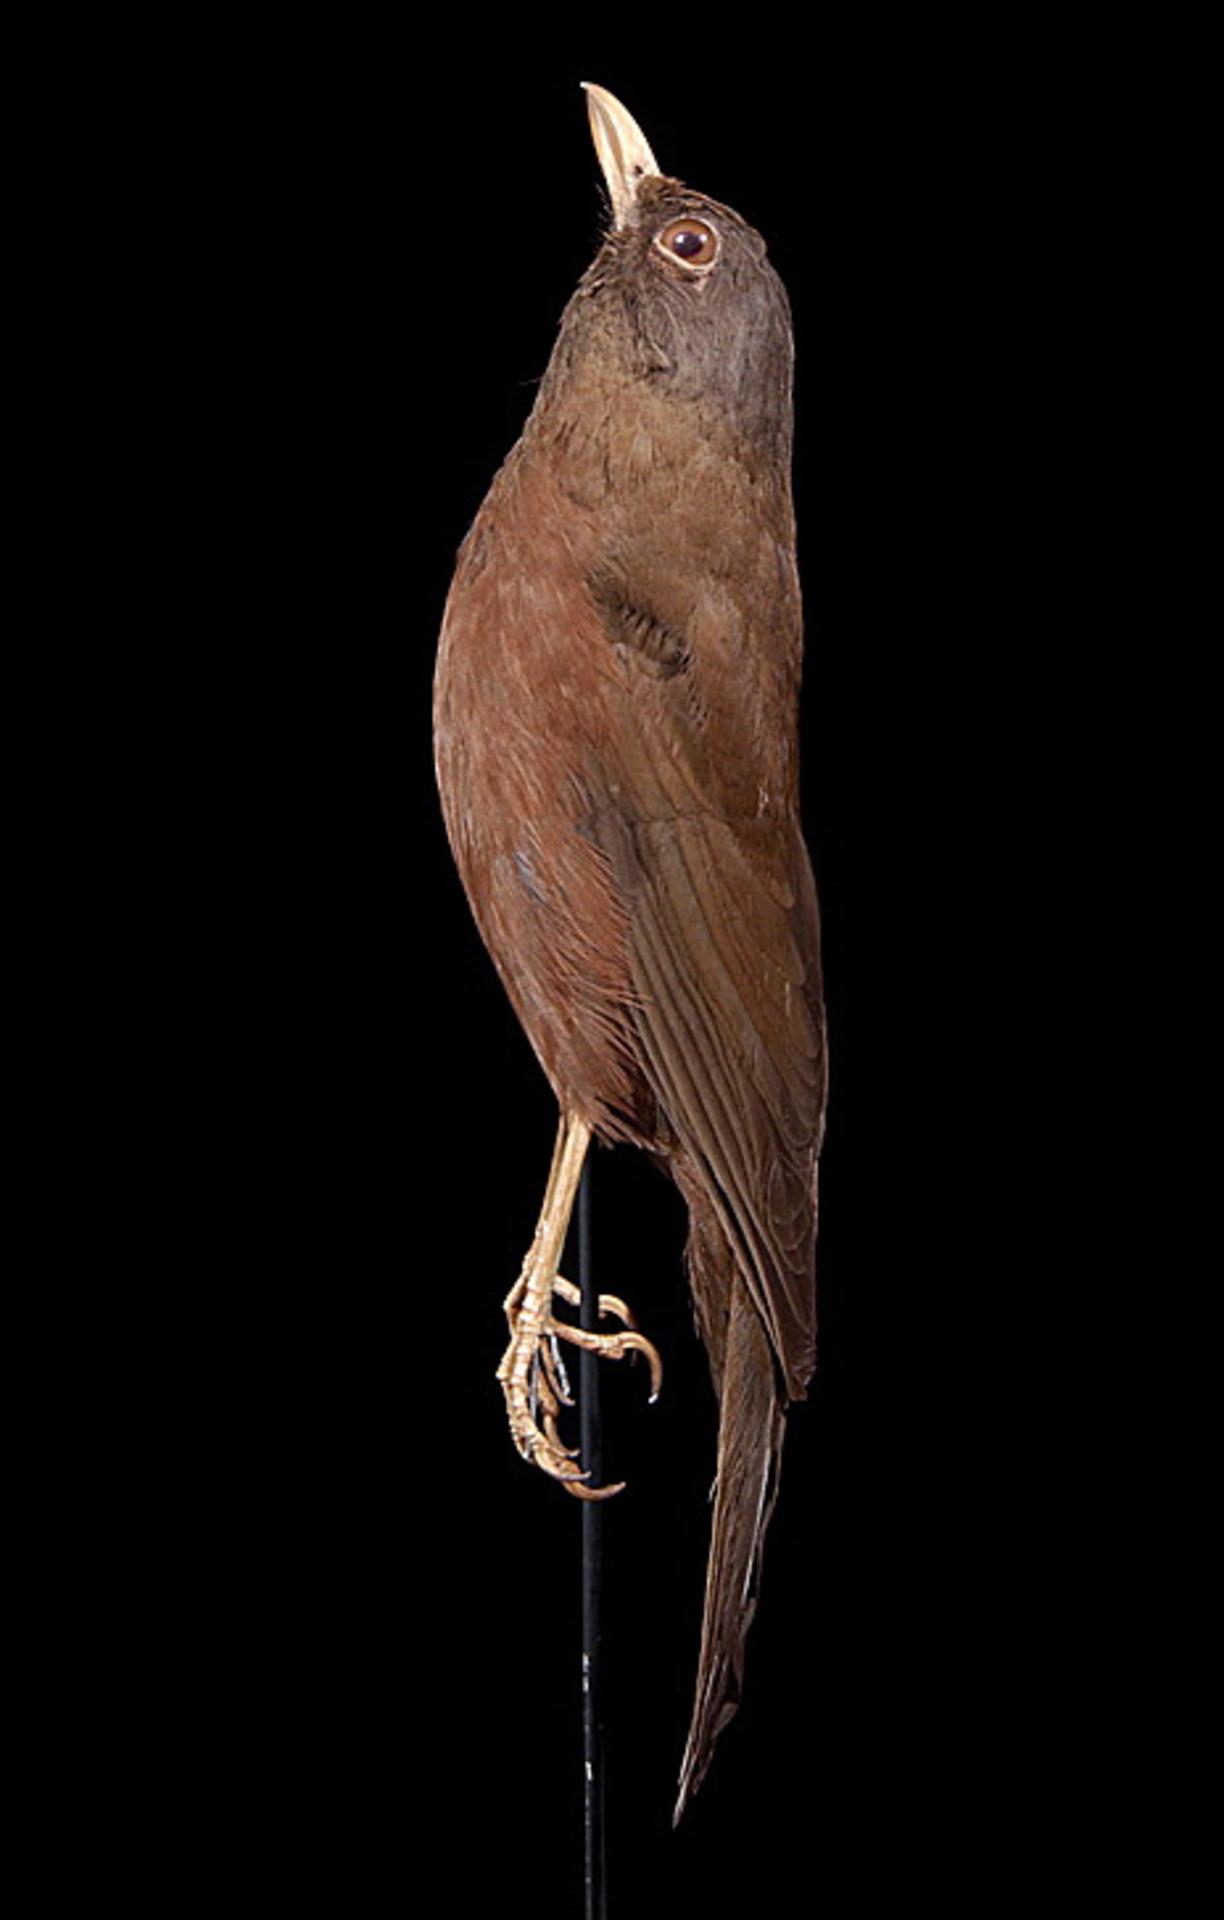 RMNH.AVES.110036   Turdus poliocephalus vinitinctus (Gould, 1855)